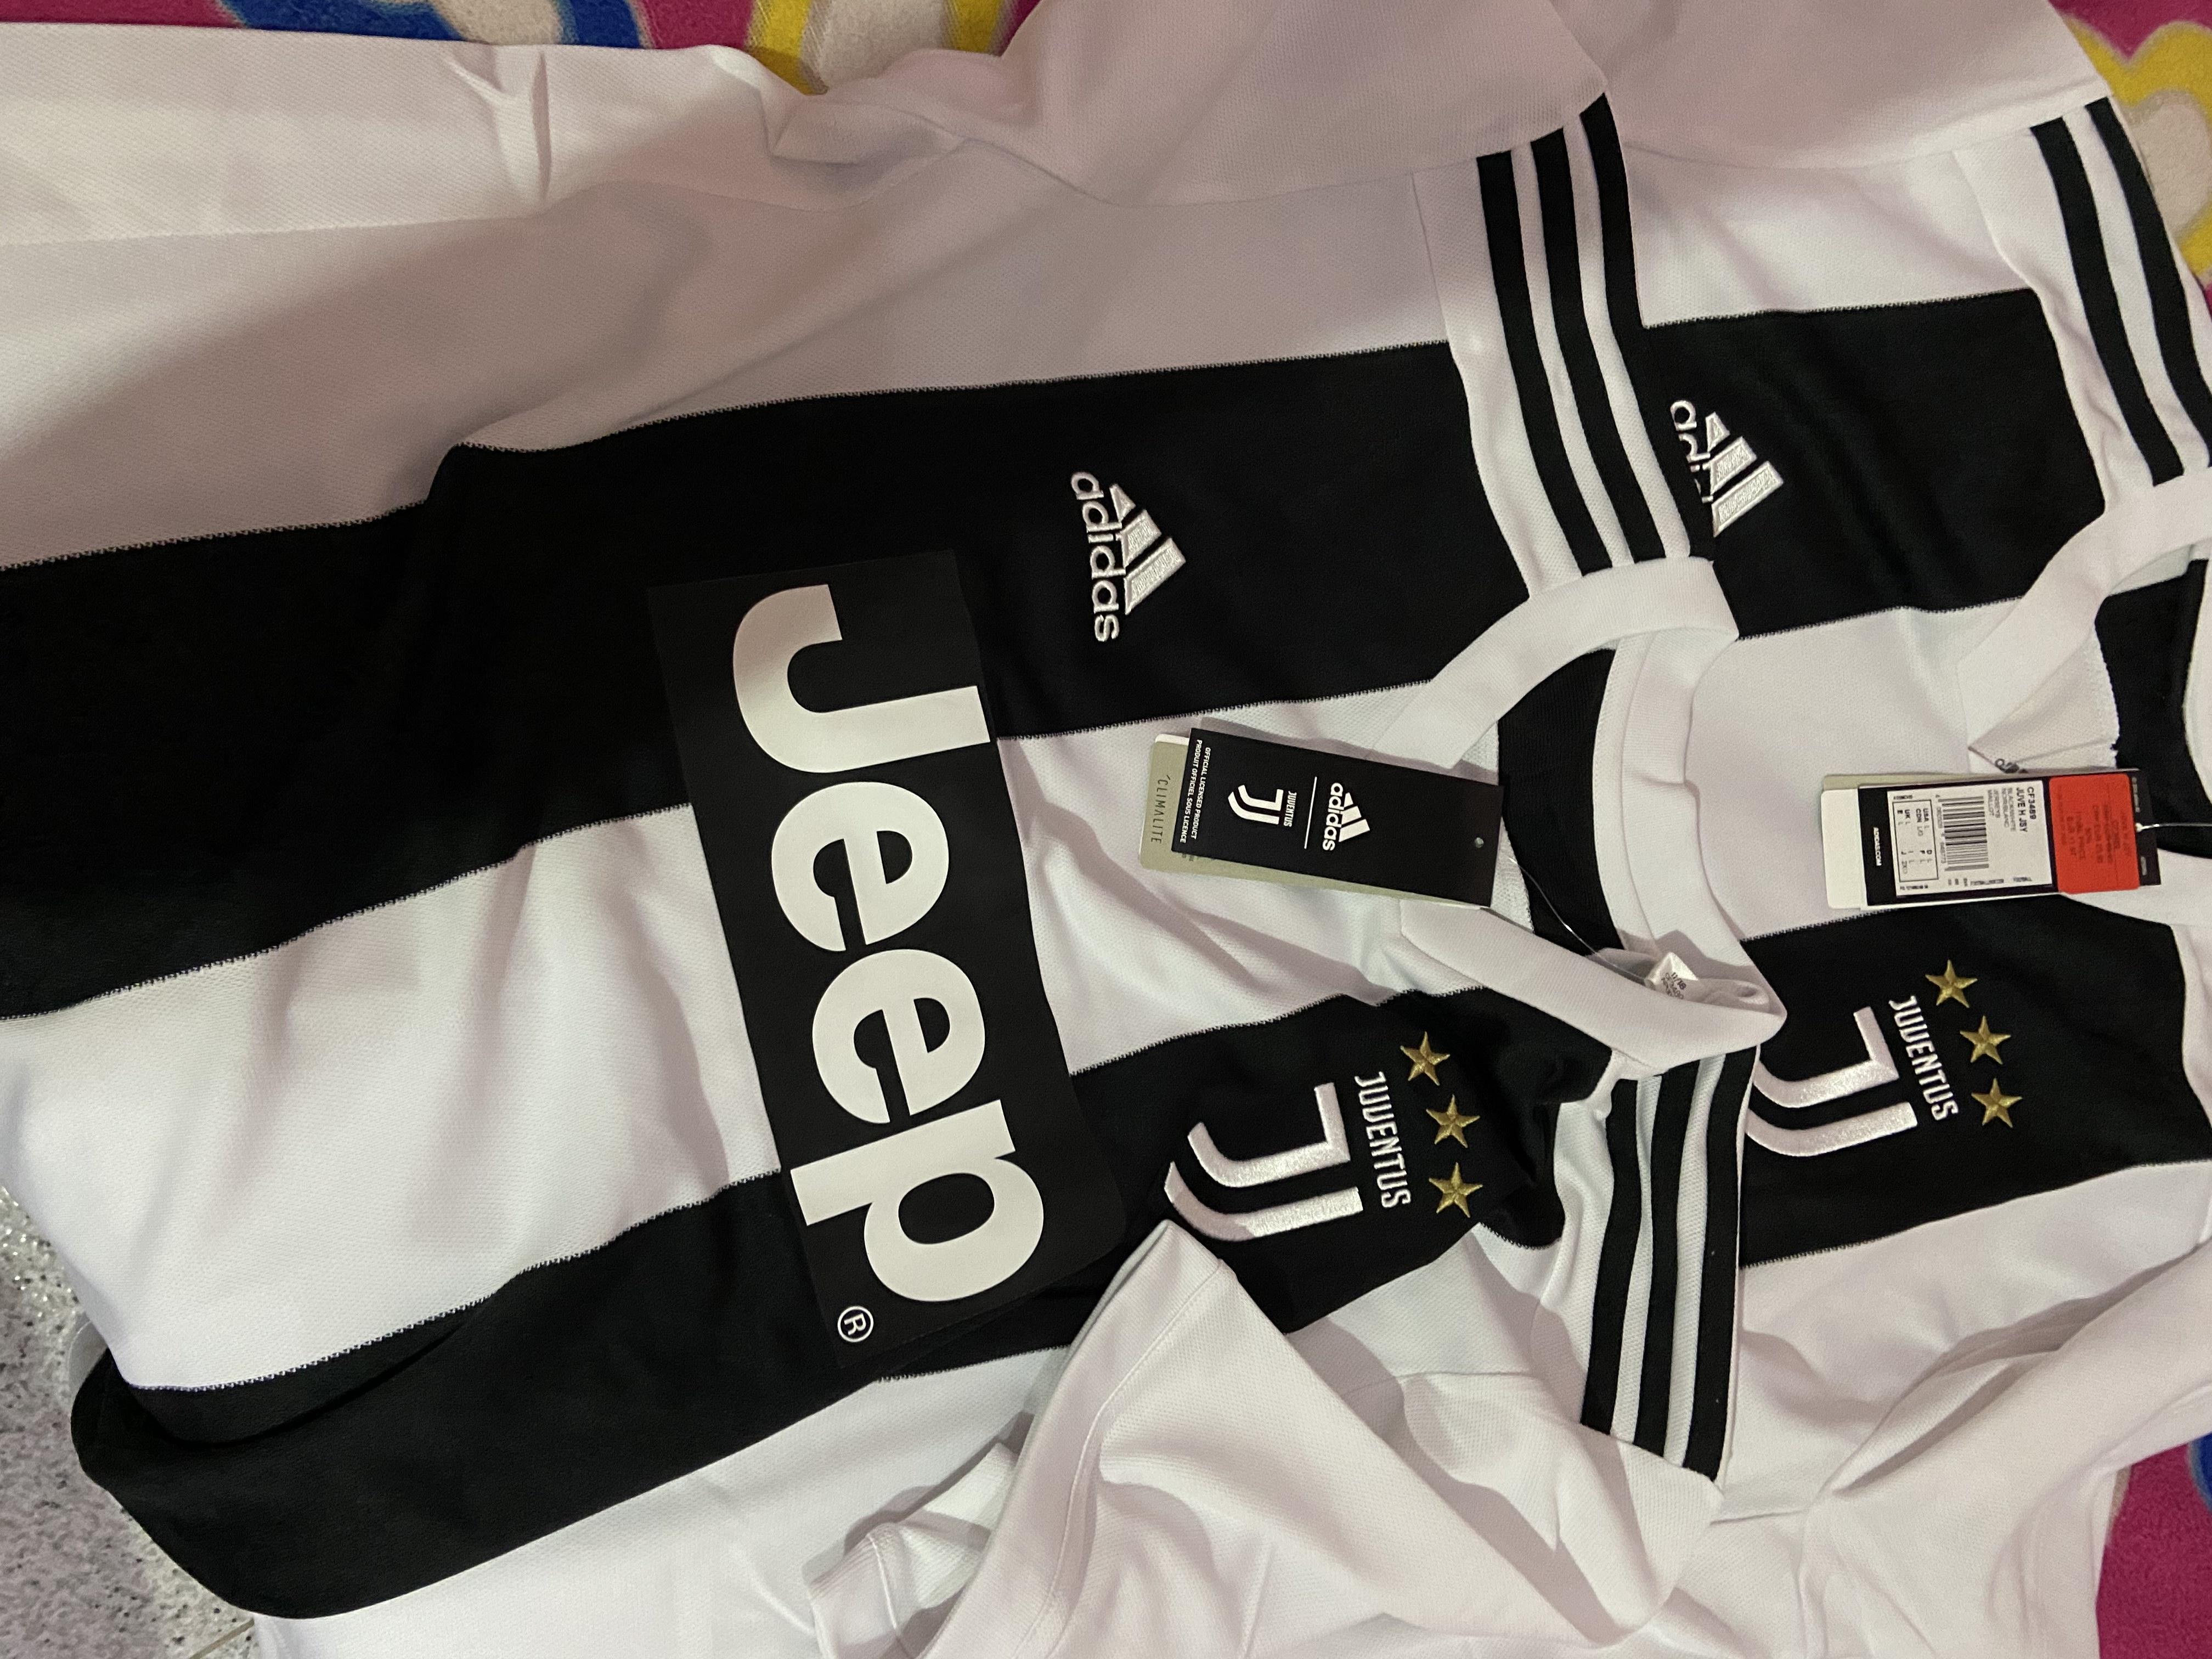 Camiseta Adidas Juventus 2018-2019 en Outlet Adidas de Viladecans (Barcelona).